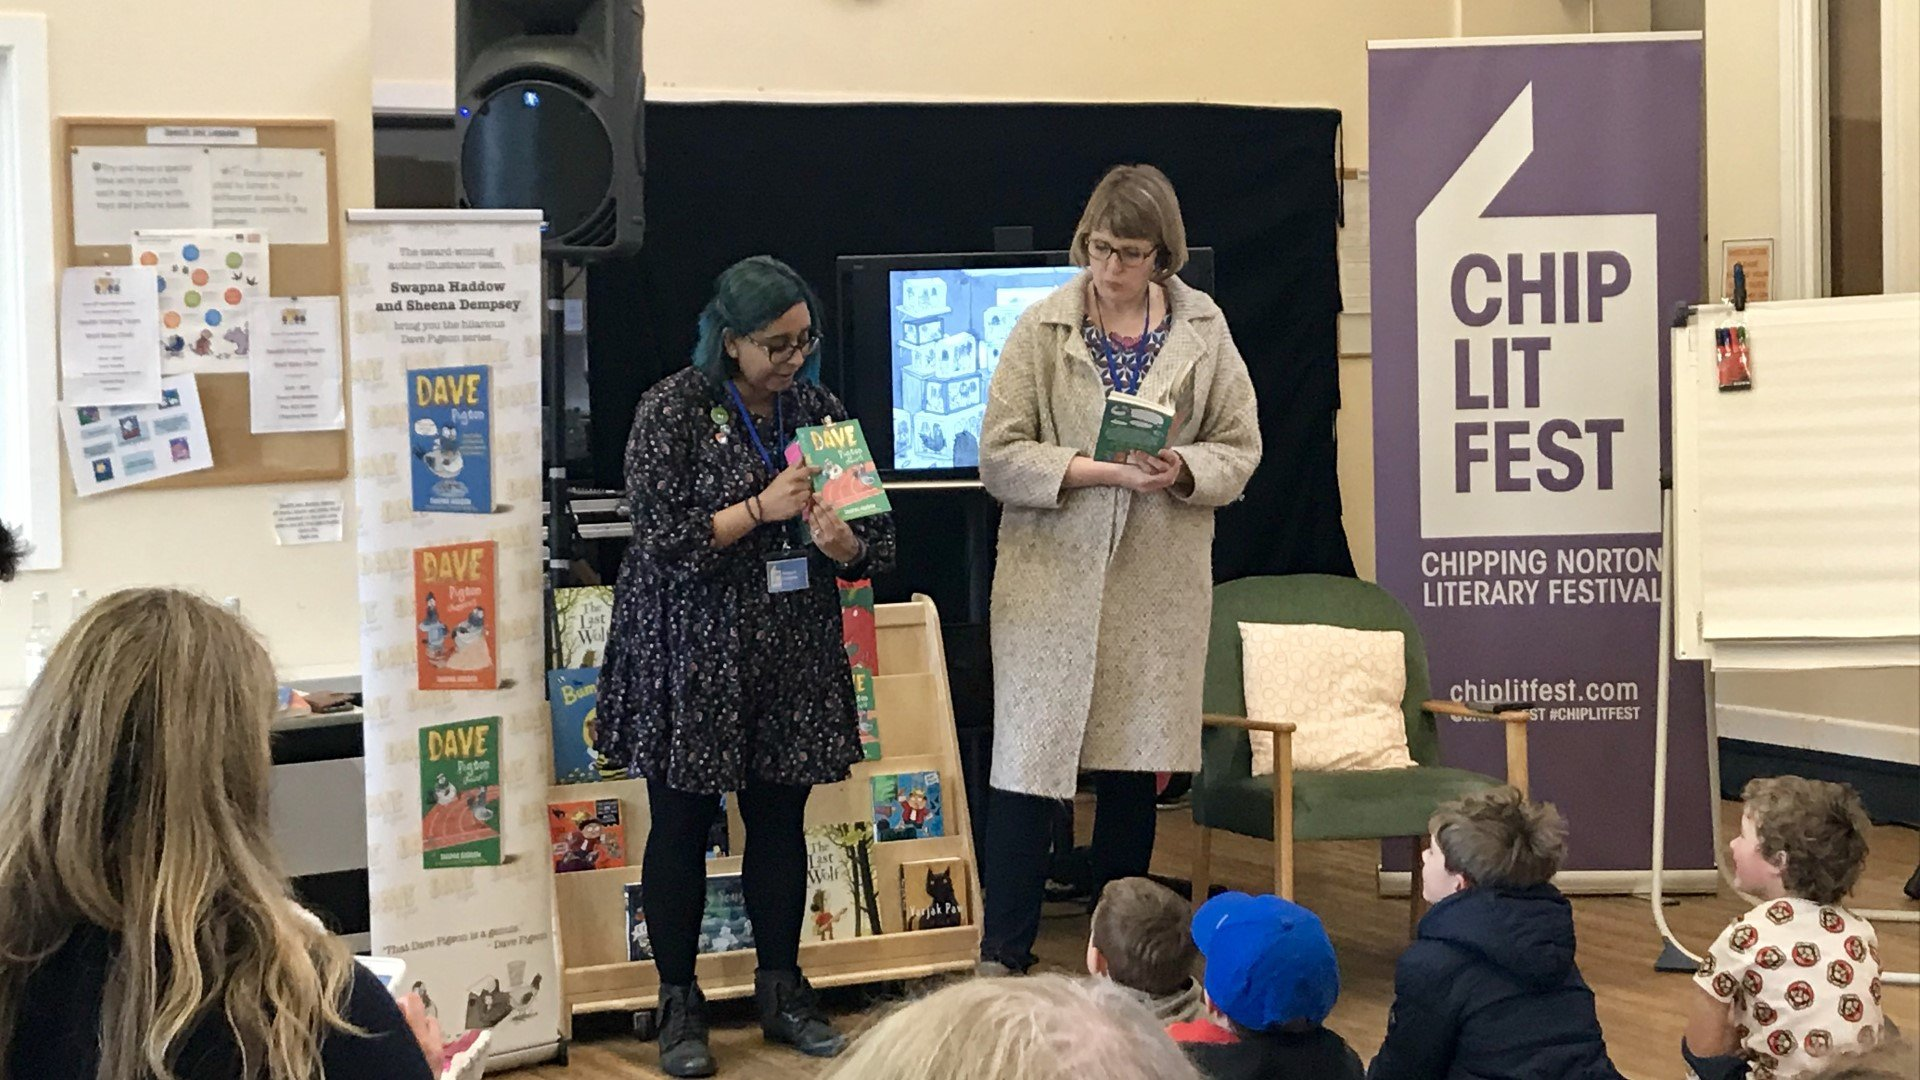 Chipping Norton Literary Festival 2020